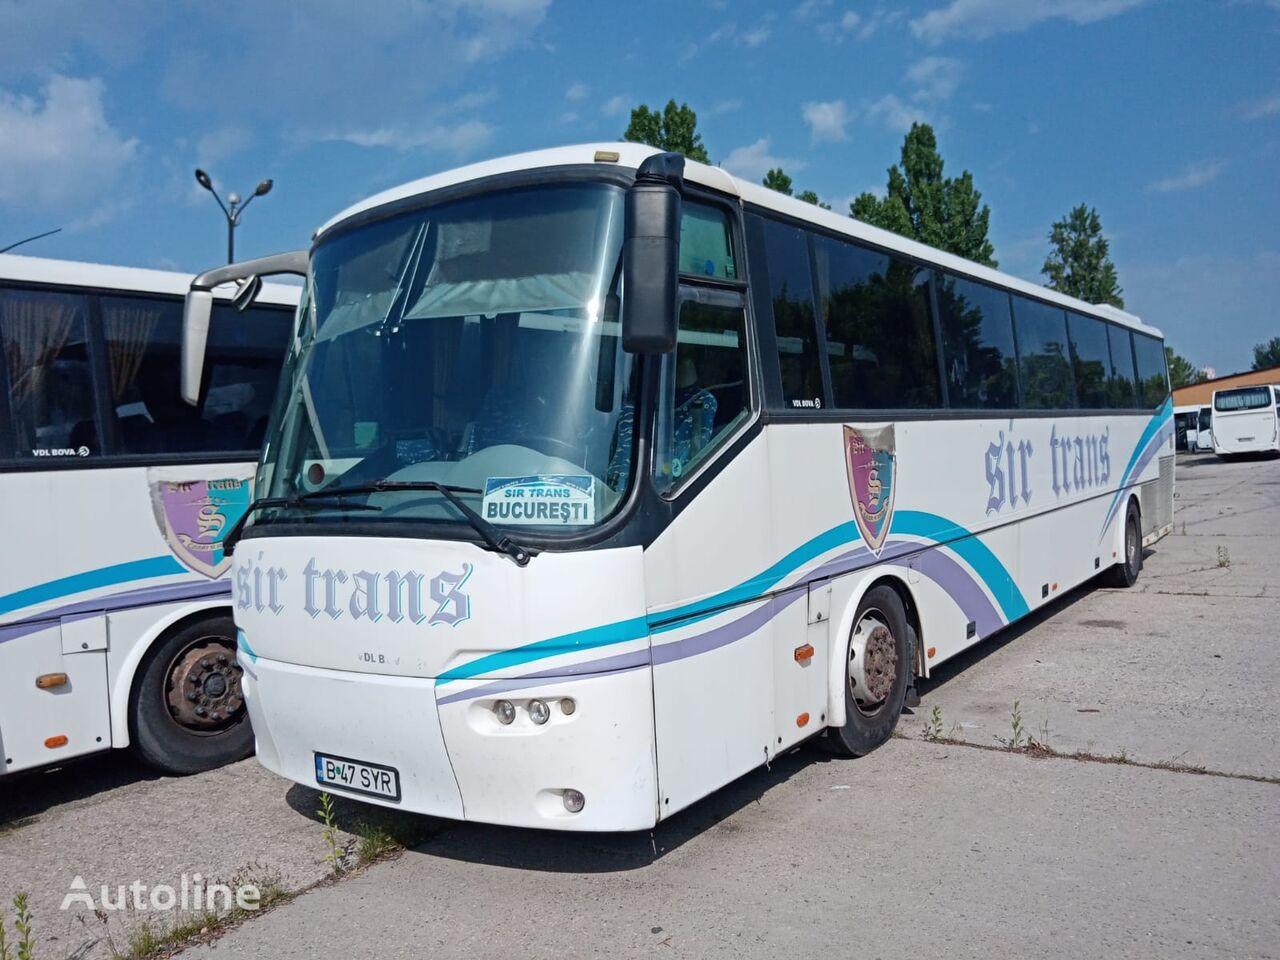 экскурсионный автобус VDL BOVA 4 X Futura FLD , 2 X Magiq, 2009,2007,2006 euro5 and euro 4